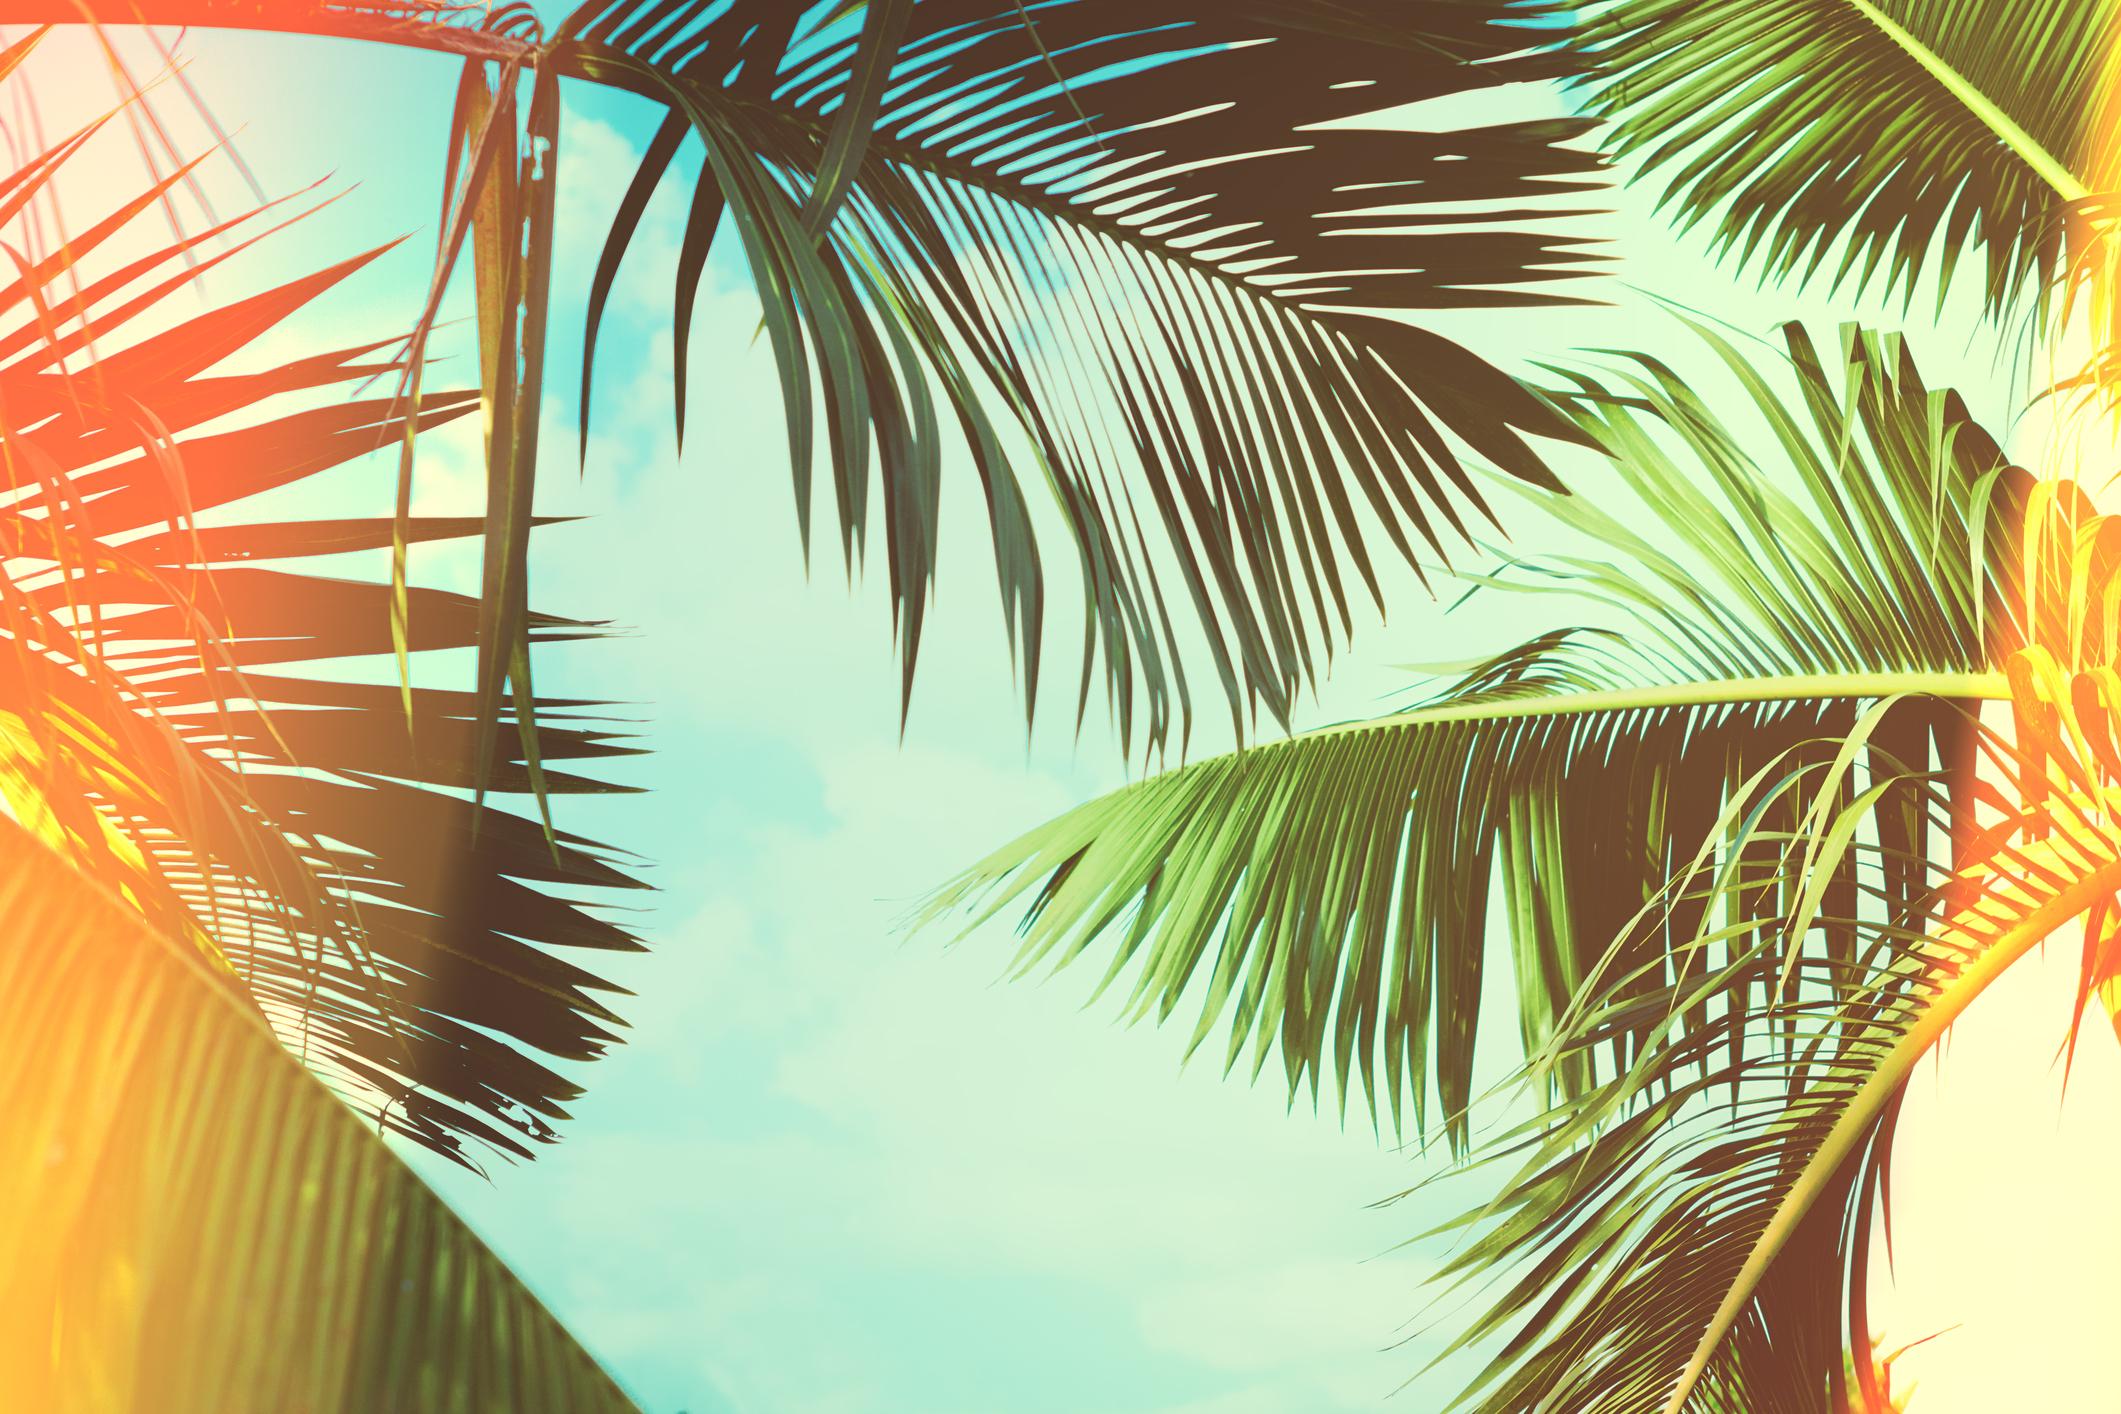 Palms_iStock-858987092.jpg